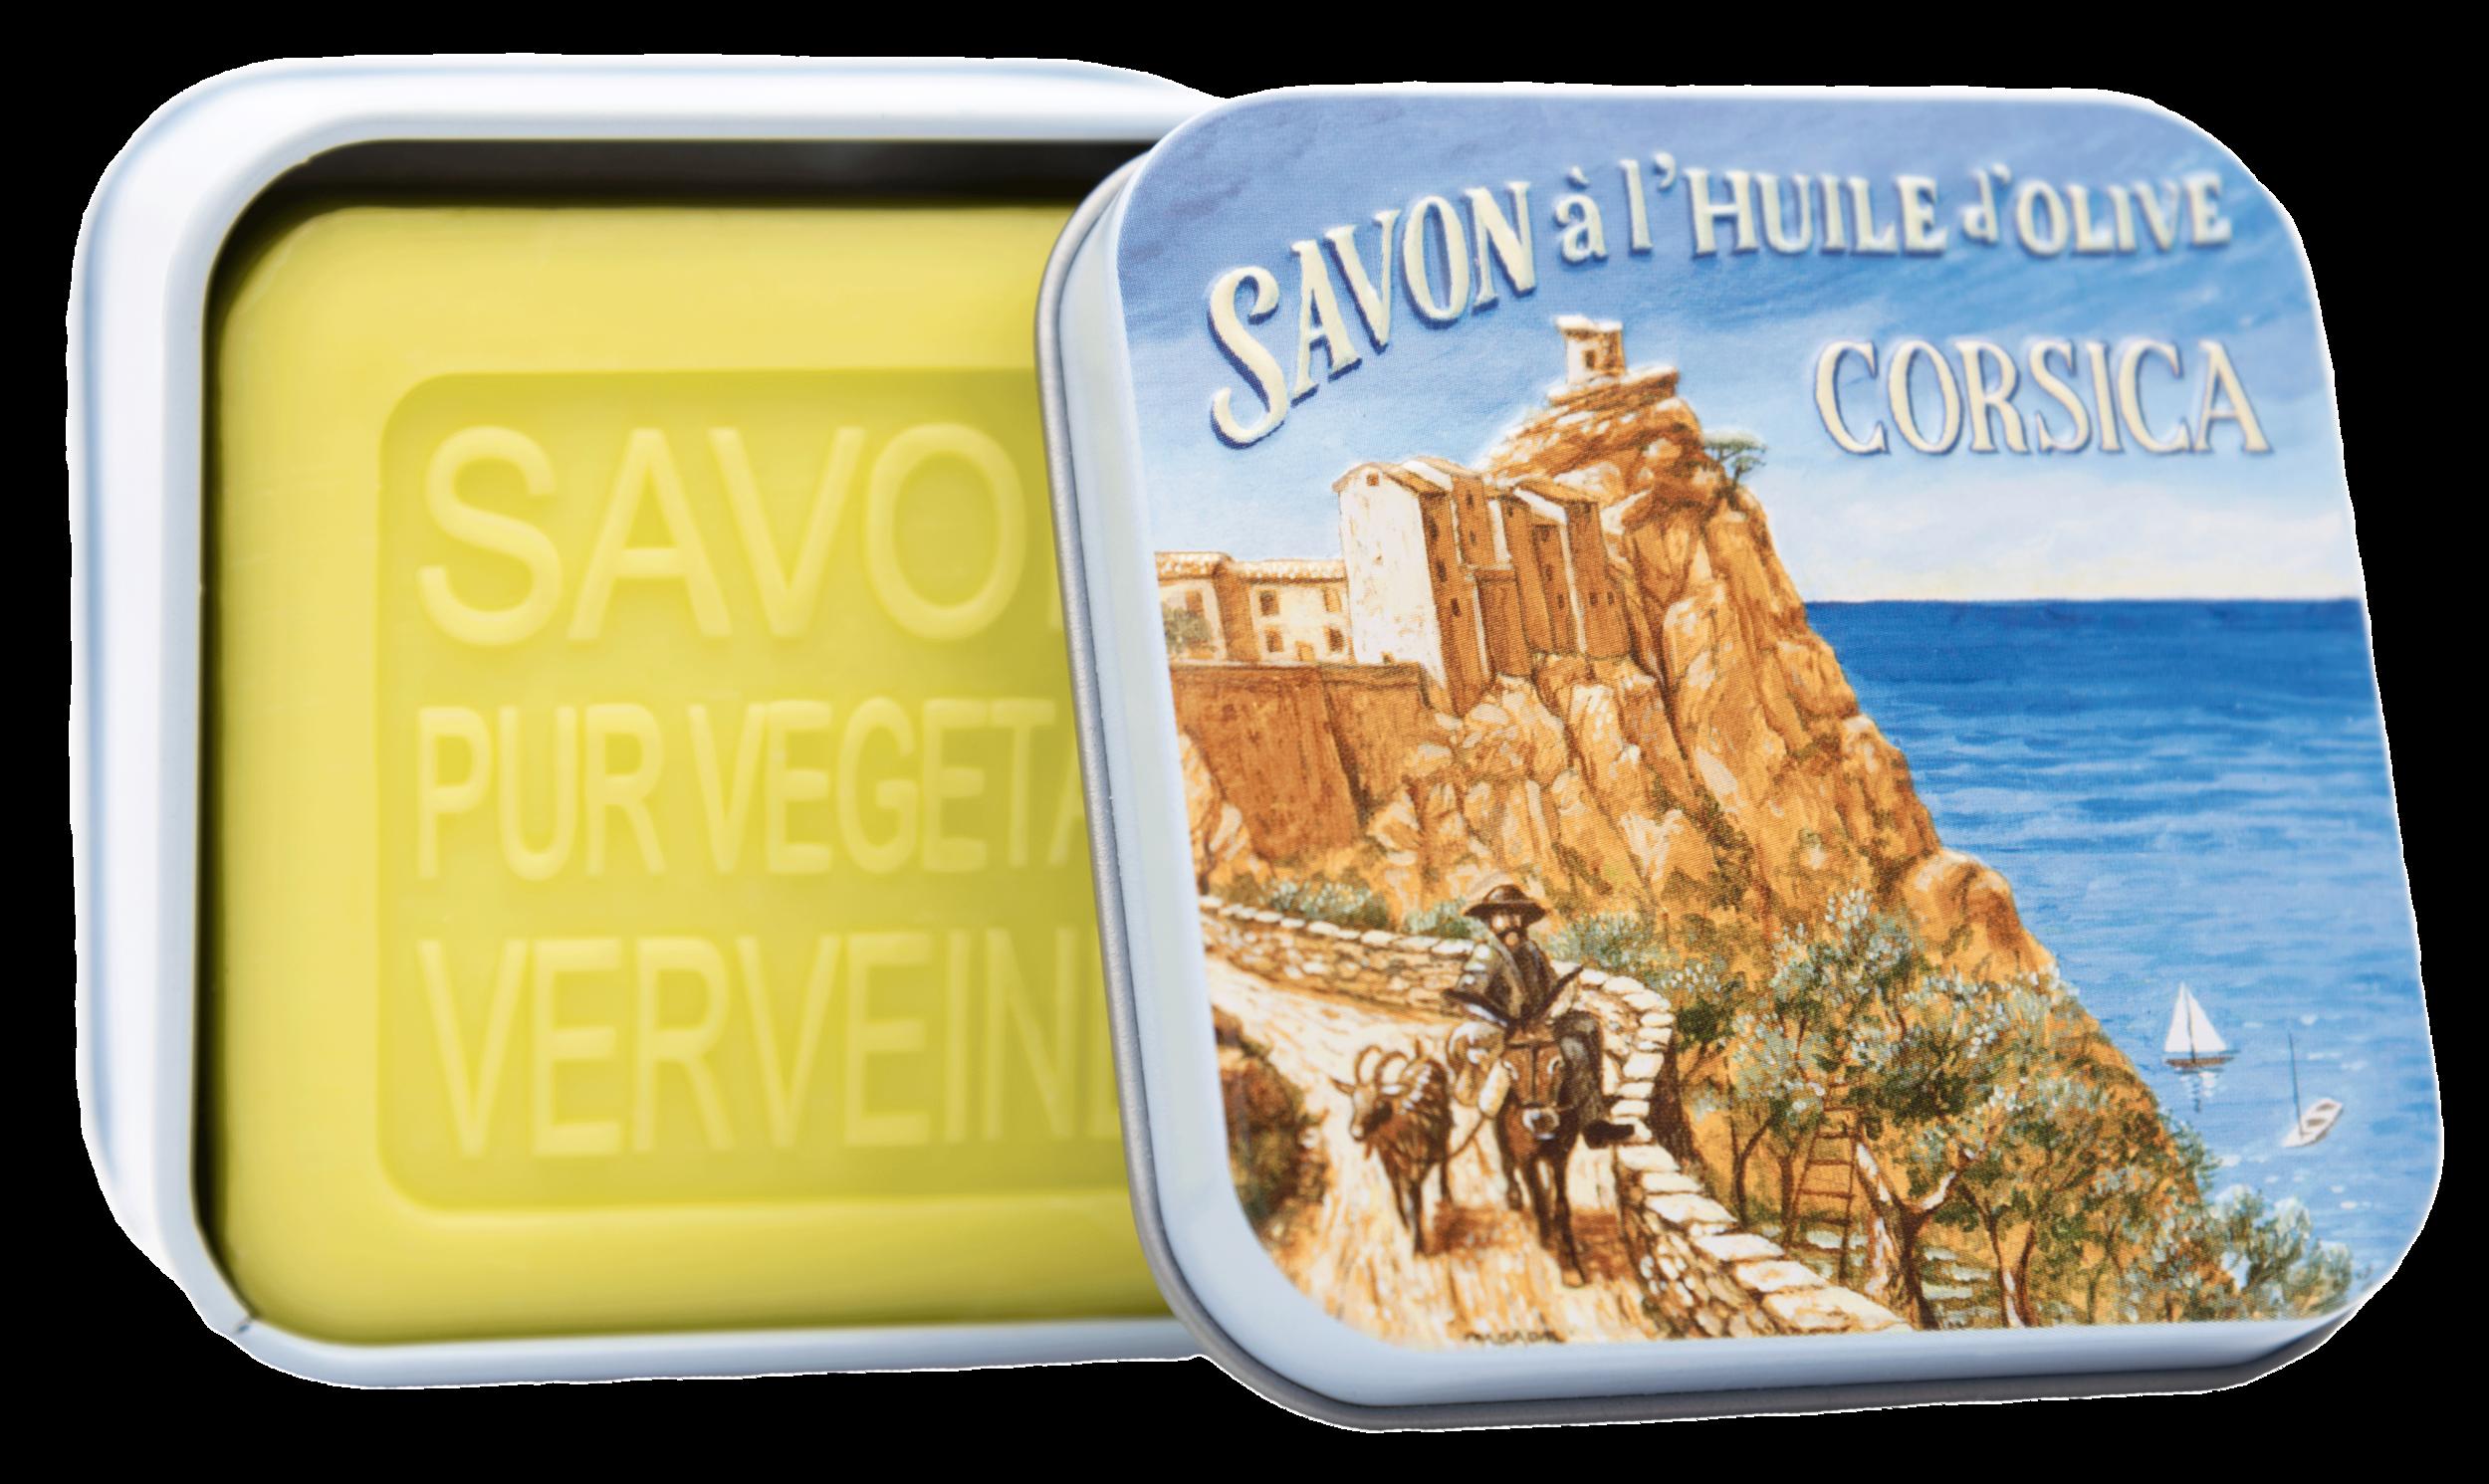 Boîte Métal Côte Corse & Savon 100g